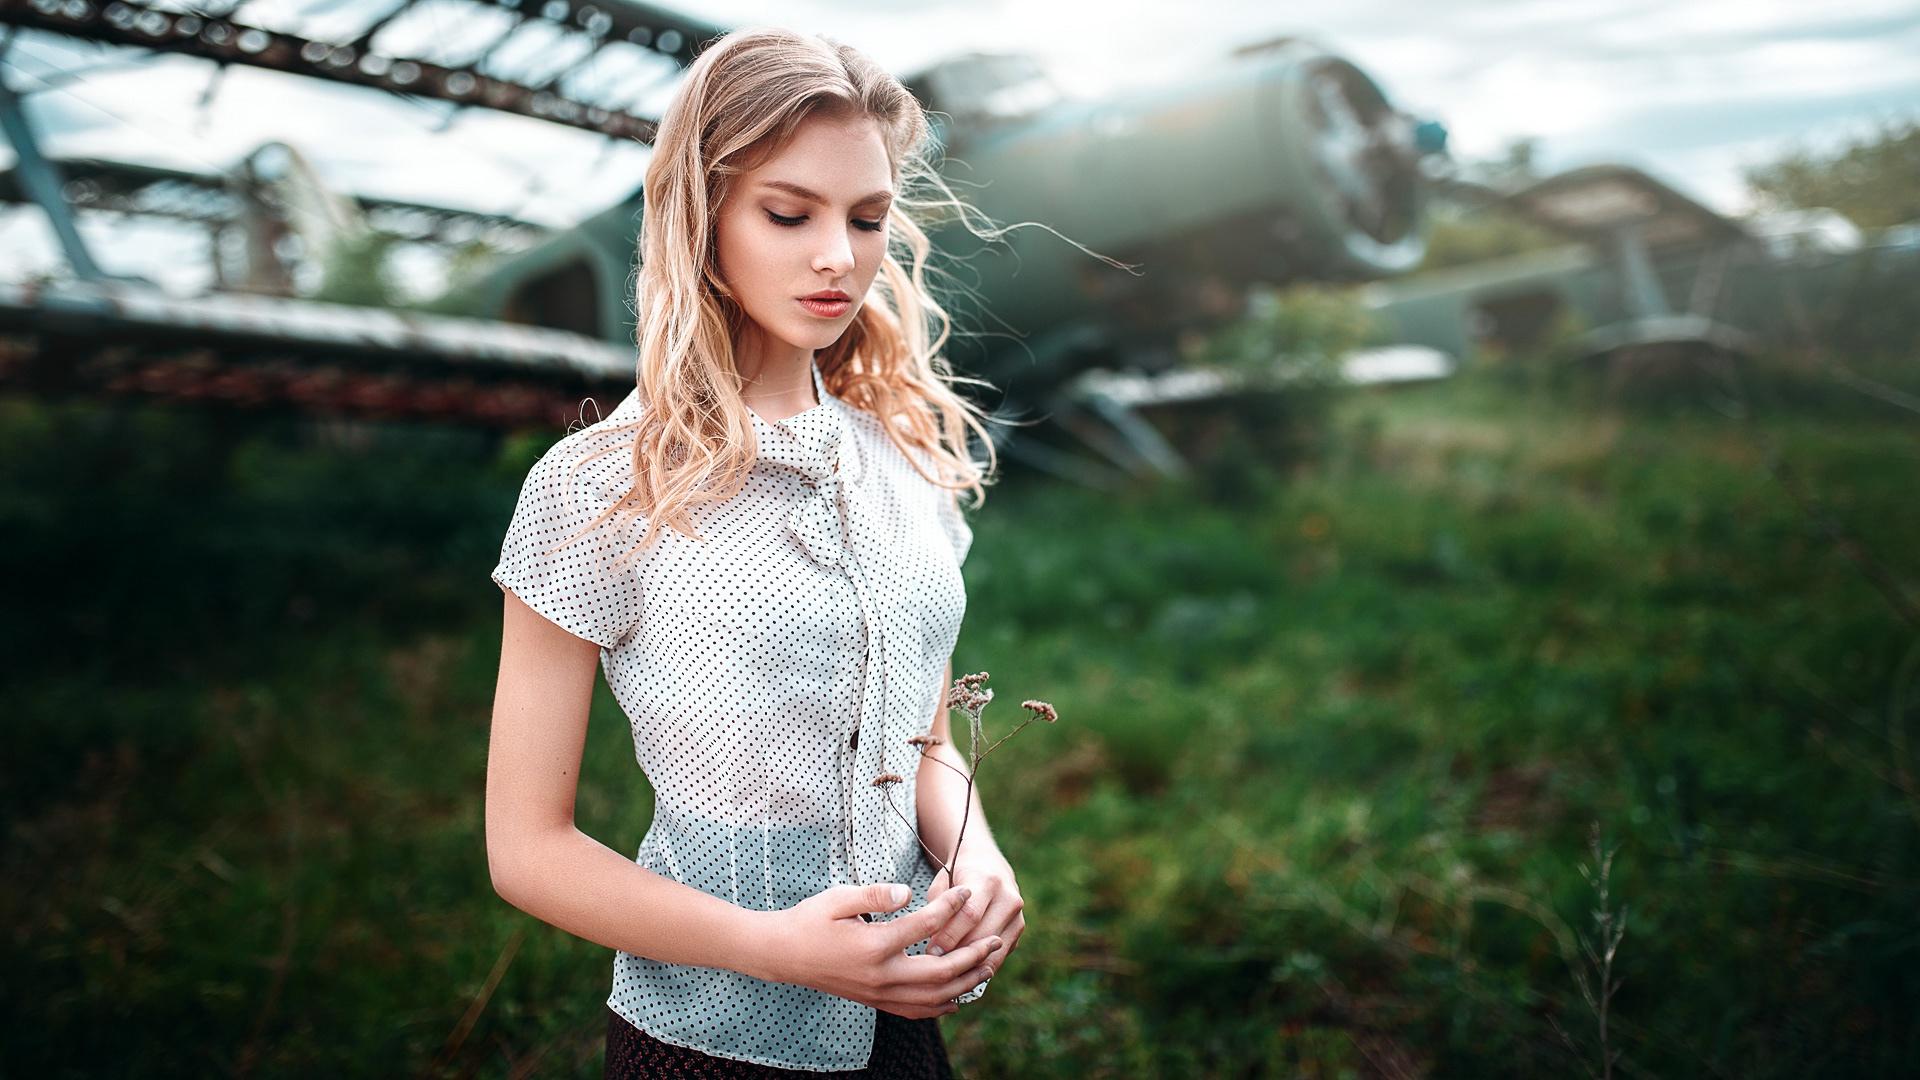 Woman Model Girl Blonde 1920x1080